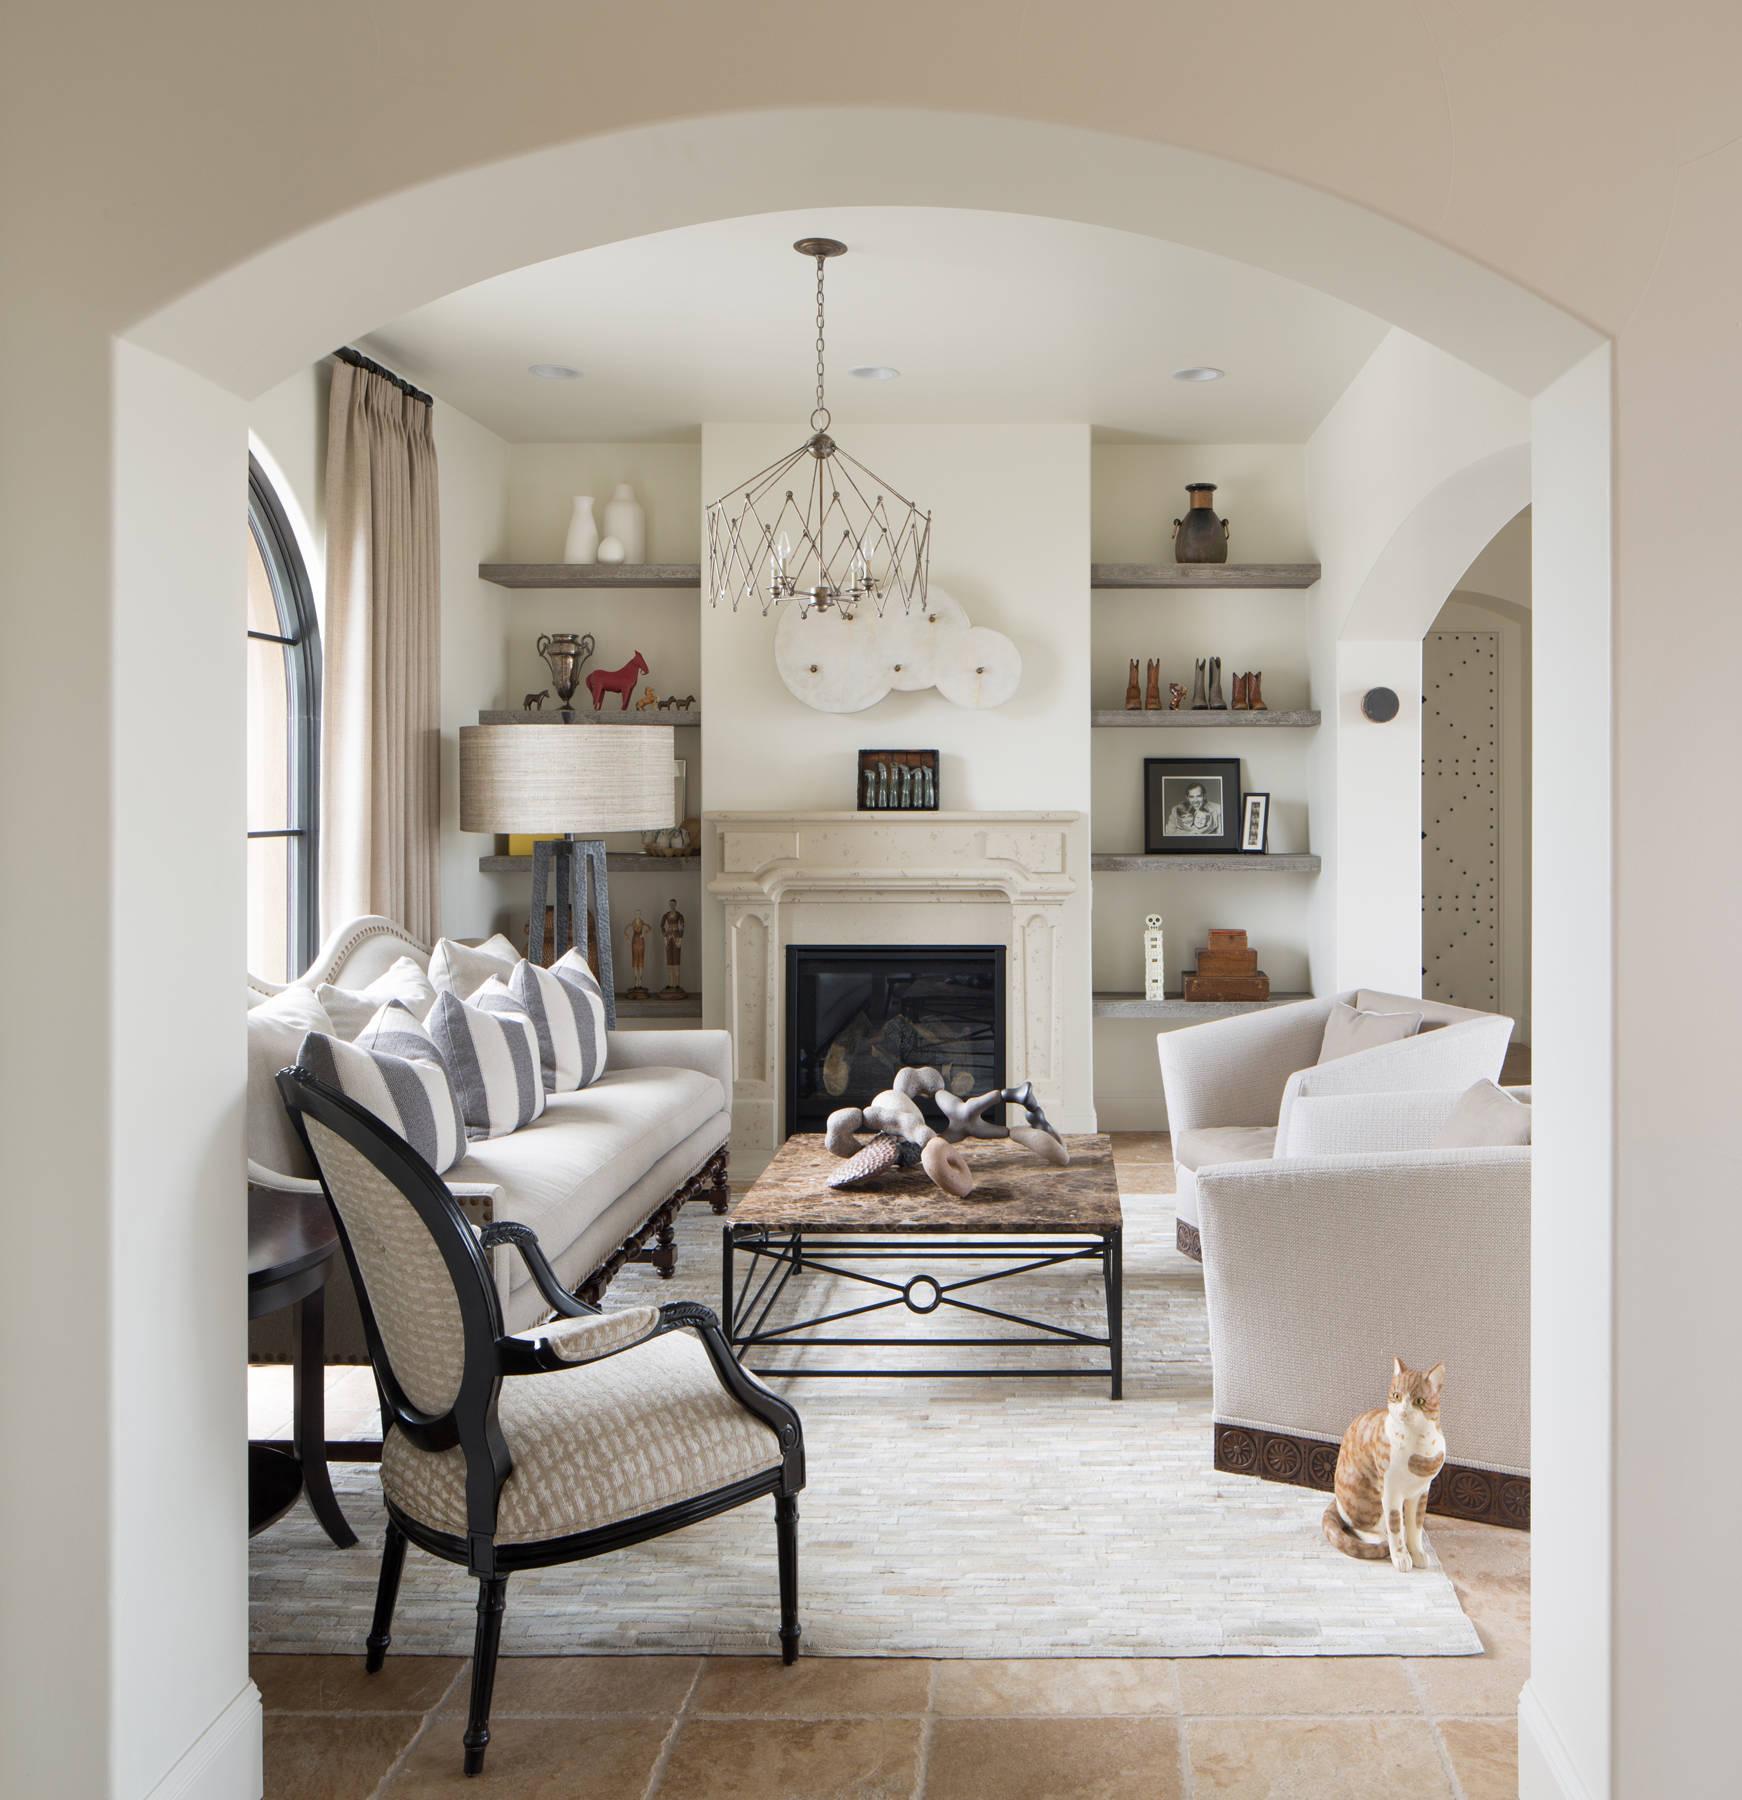 Sala Da Pranzo Country Chic 75 beautiful rustic ceramic floor living room pictures